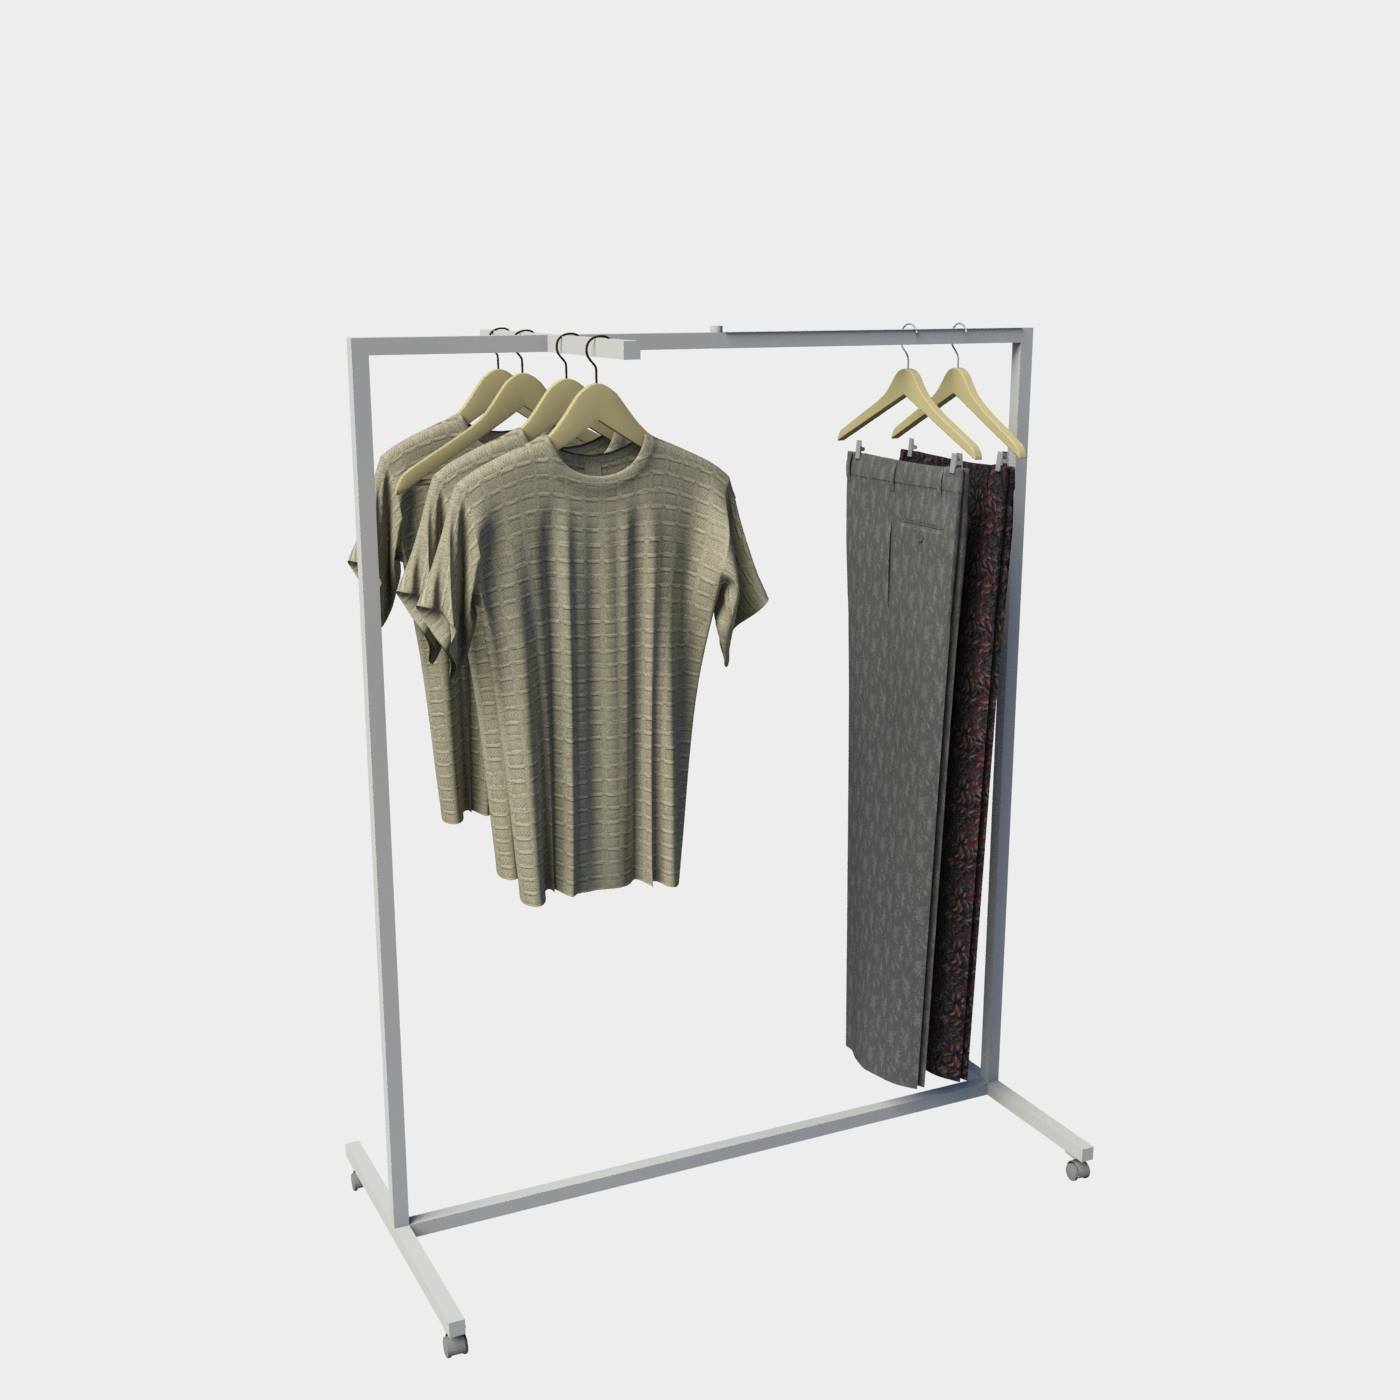 ab74b5eb790 Stand επιδαπέδιο ρούχων καταστημάτων έπιπλα καταστήματος διακόσμηση  εξοπλισμός ένδυσης